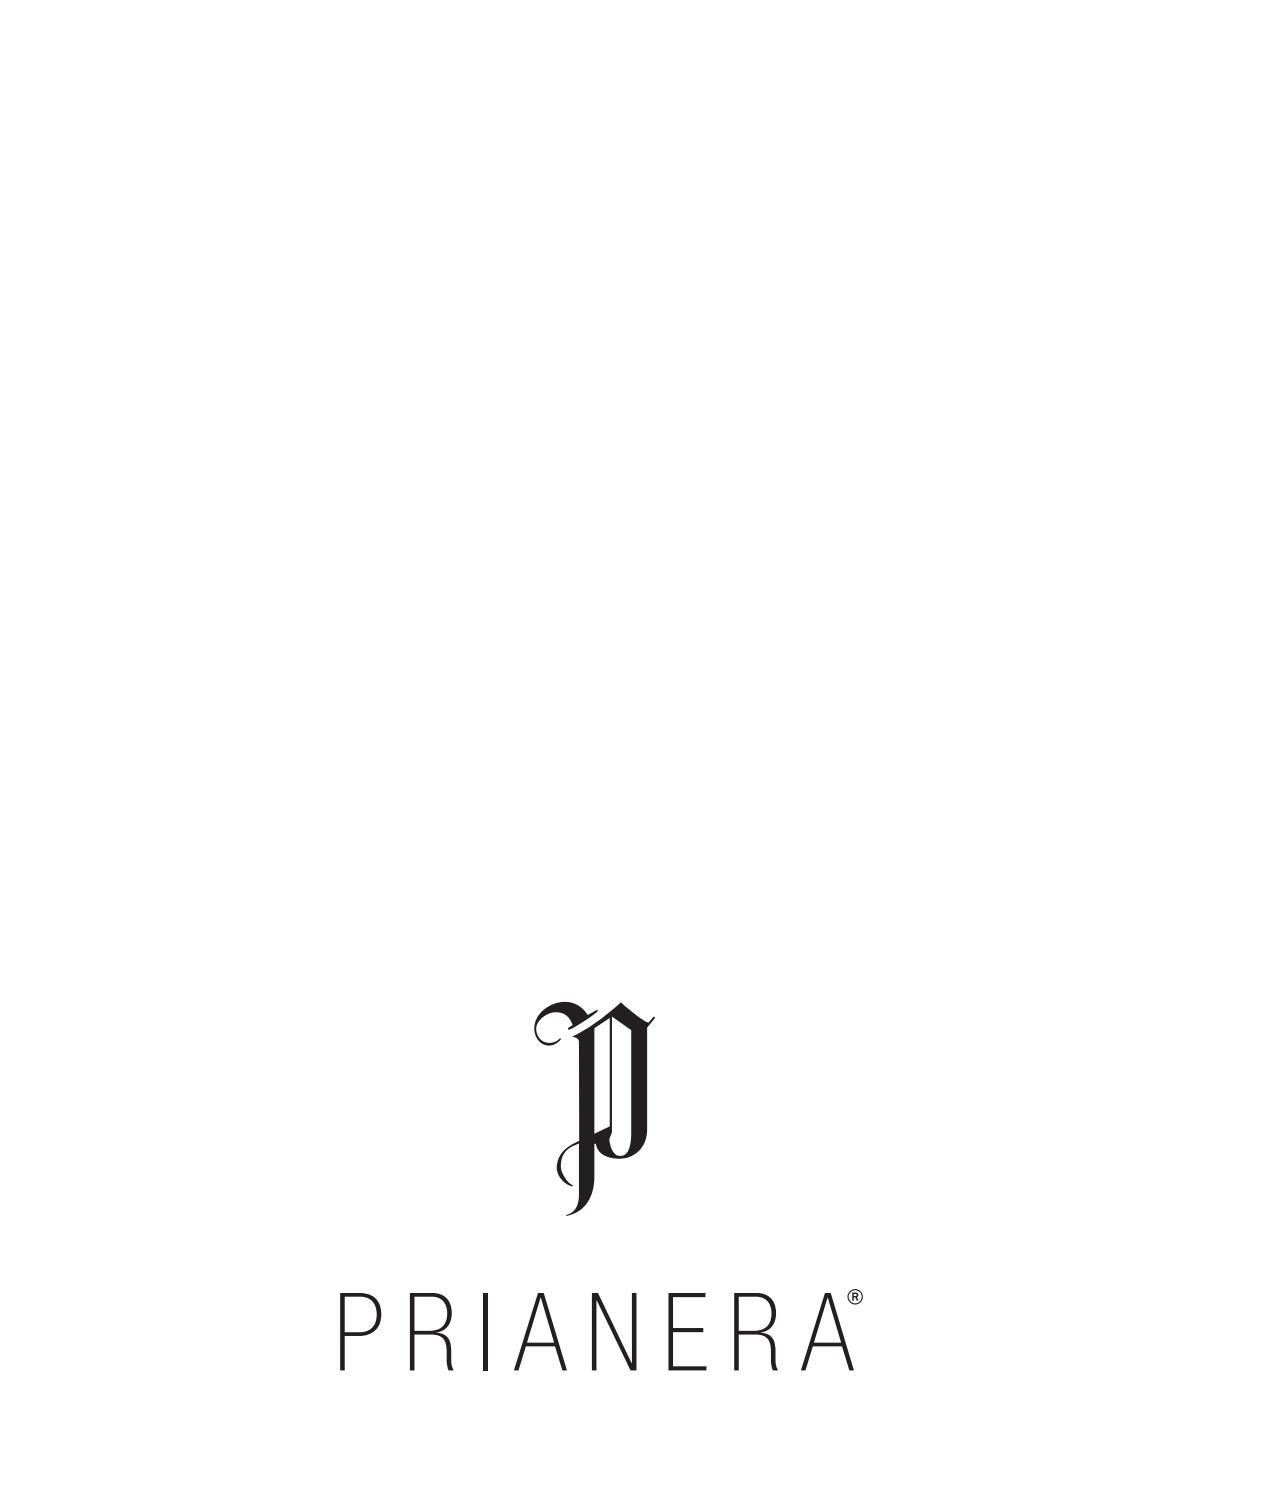 Polaris Designed For Living Srl xtra prianera black catalogue by xtra furniture - issuu